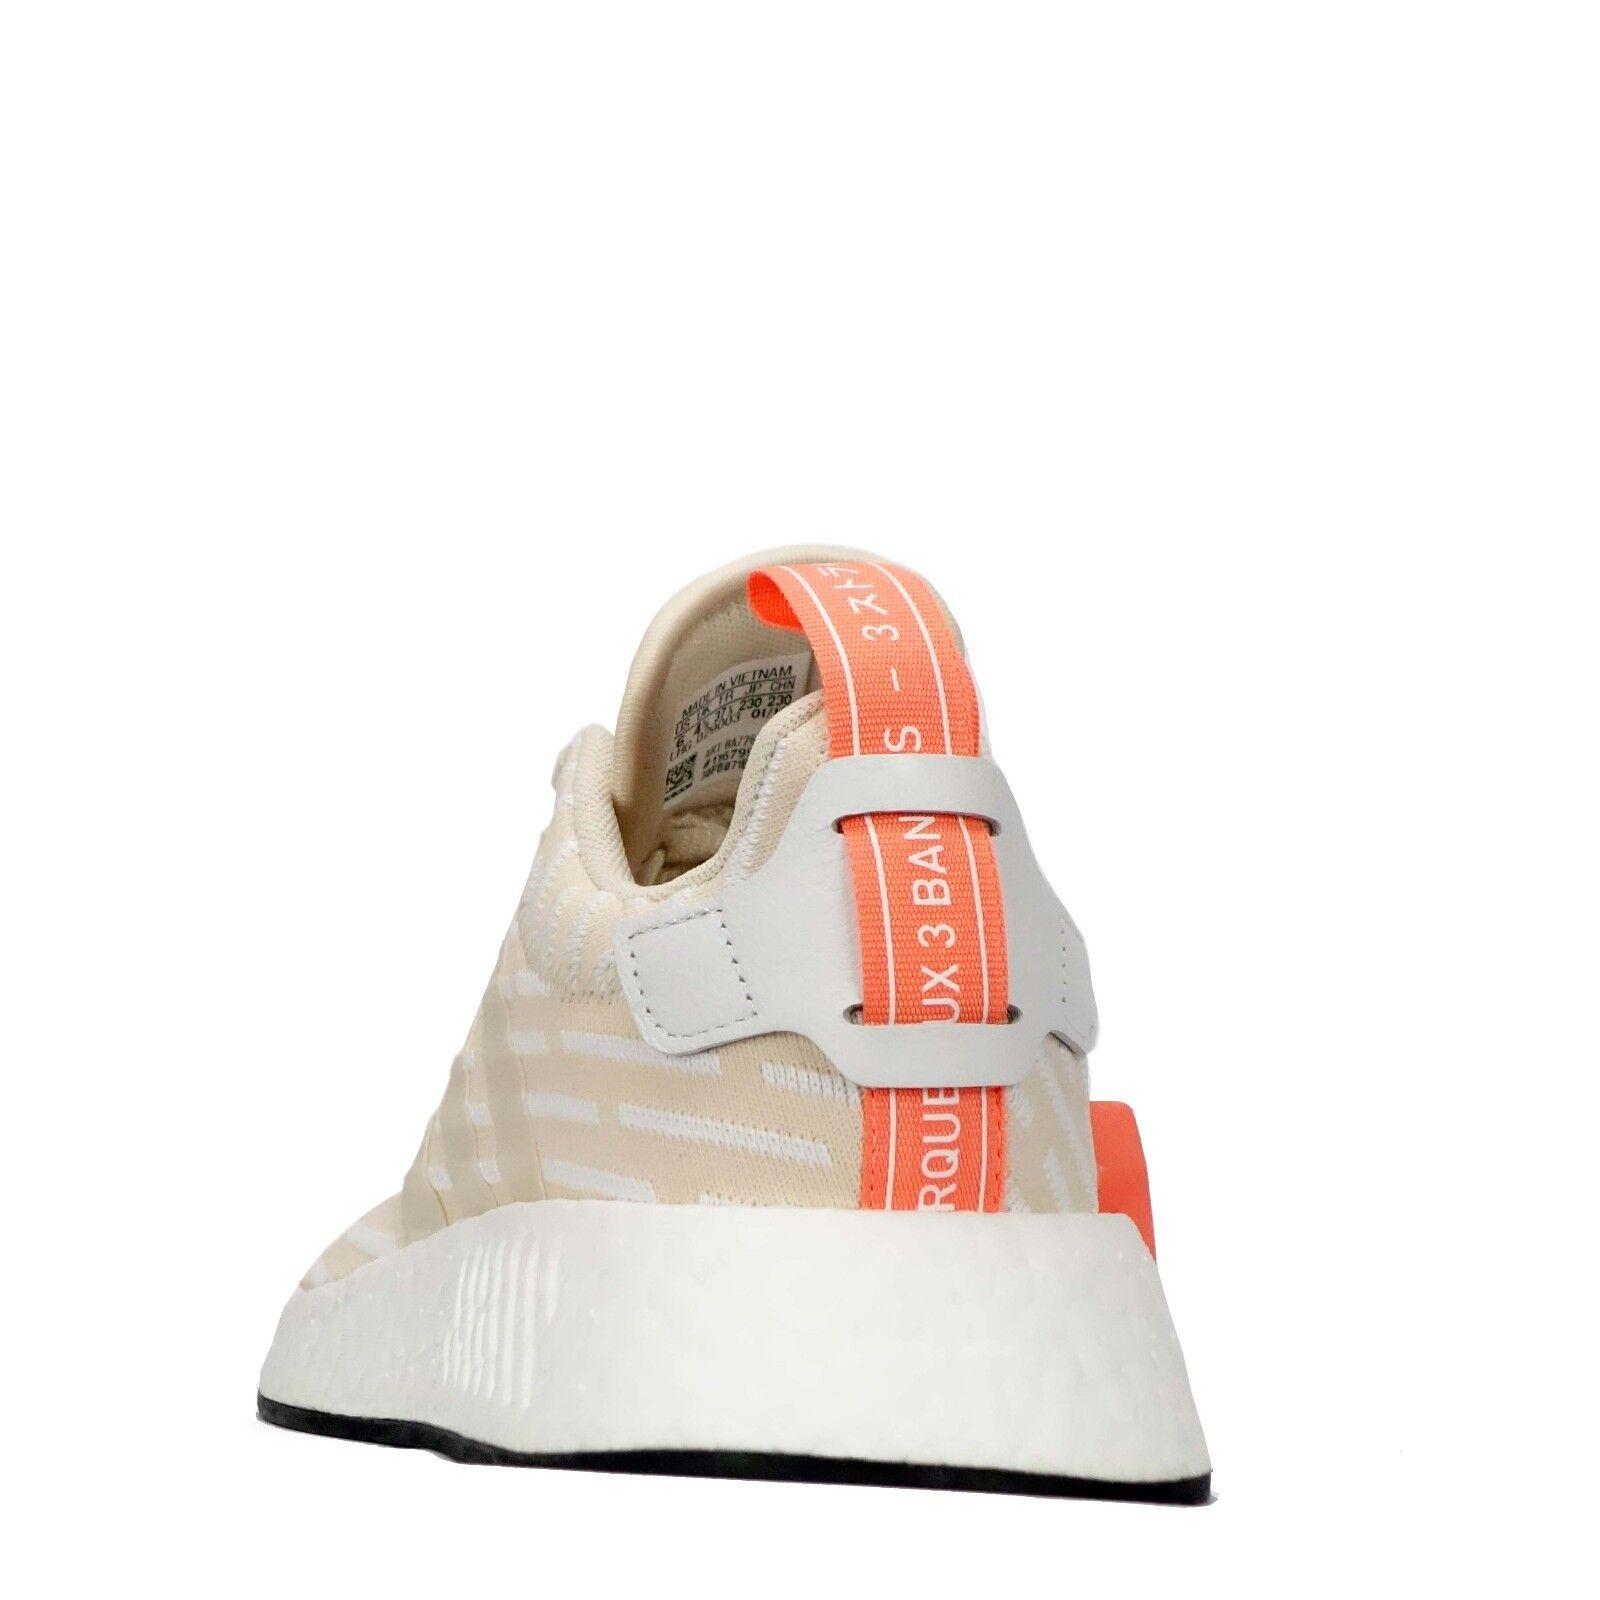 Adidas en Originals NMD R2 rouleau en Adidas Tricot Chaussures femmes beige 739d37